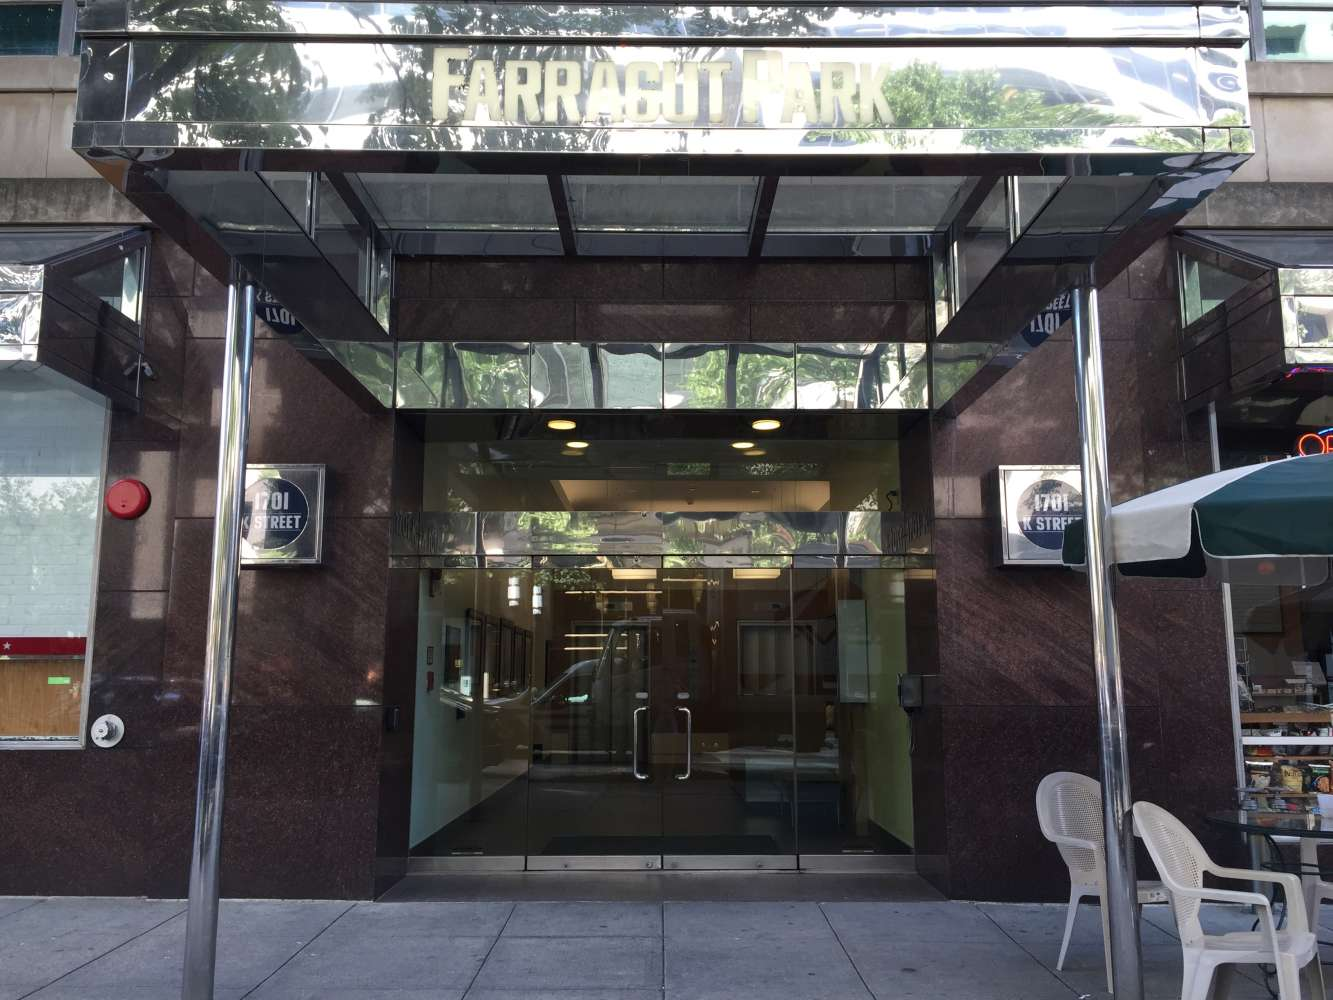 Office Washington, 20006 - Farragut Park